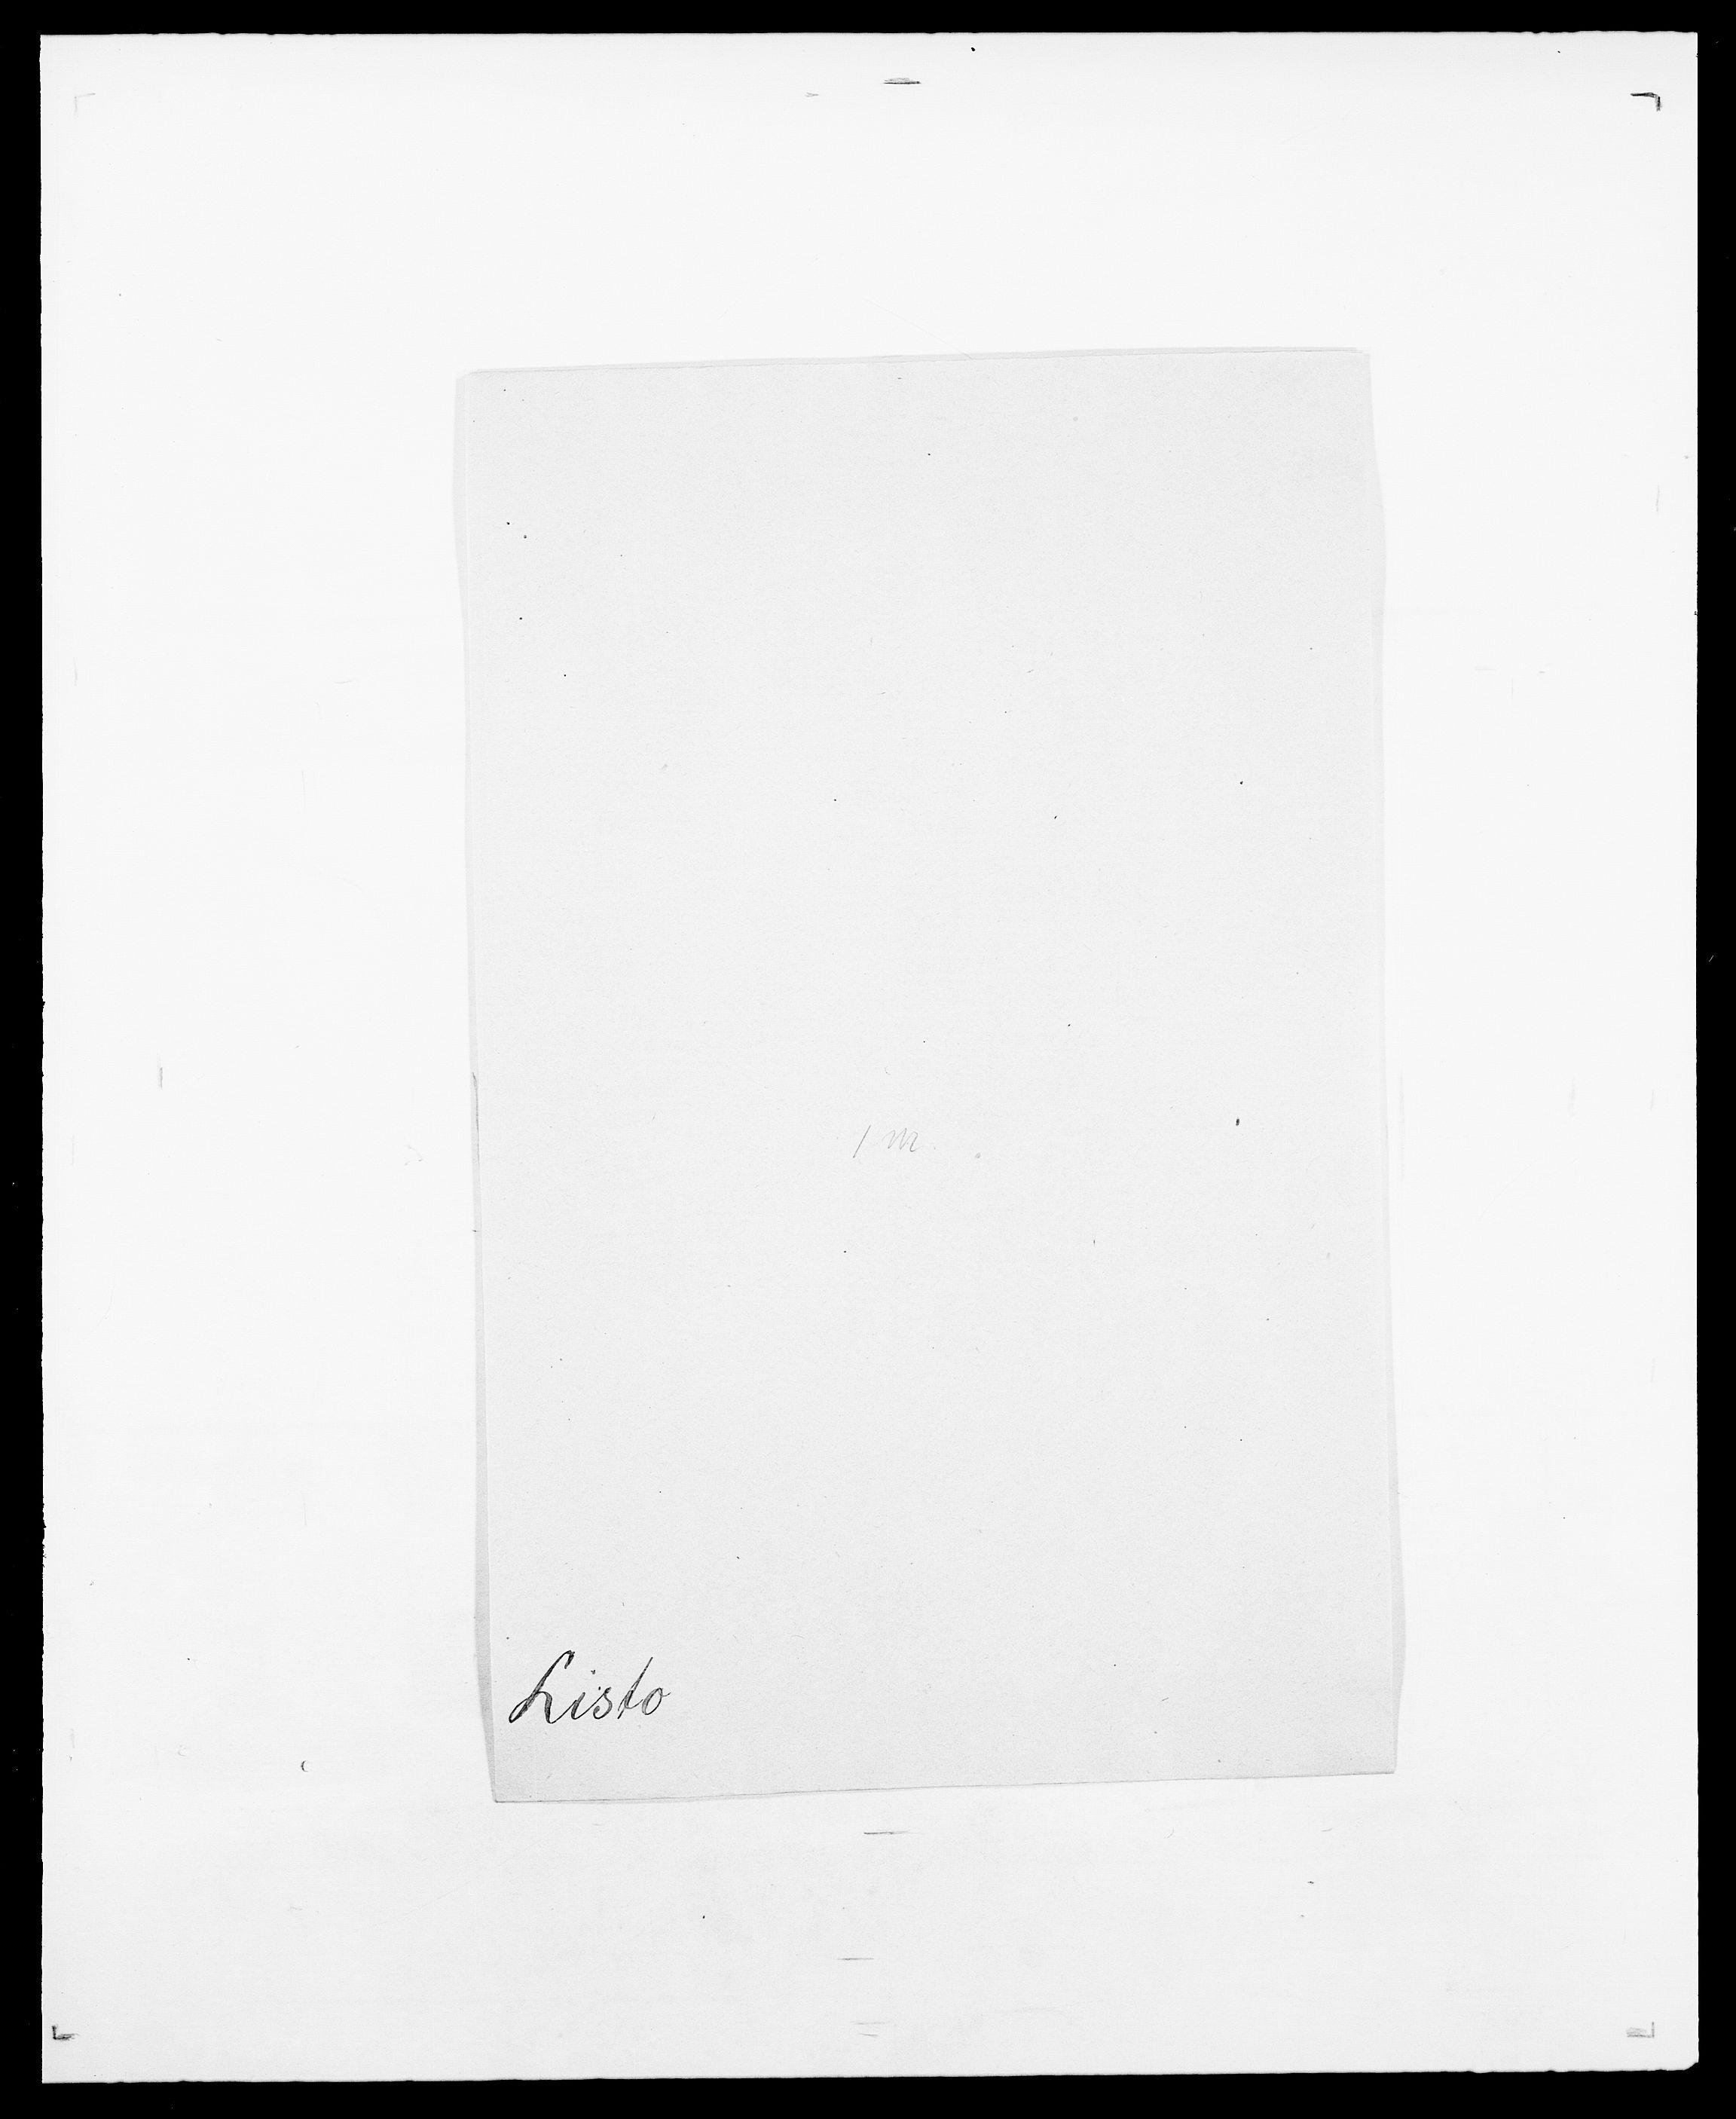 SAO, Delgobe, Charles Antoine - samling, D/Da/L0023: Lau - Lirvyn, s. 701